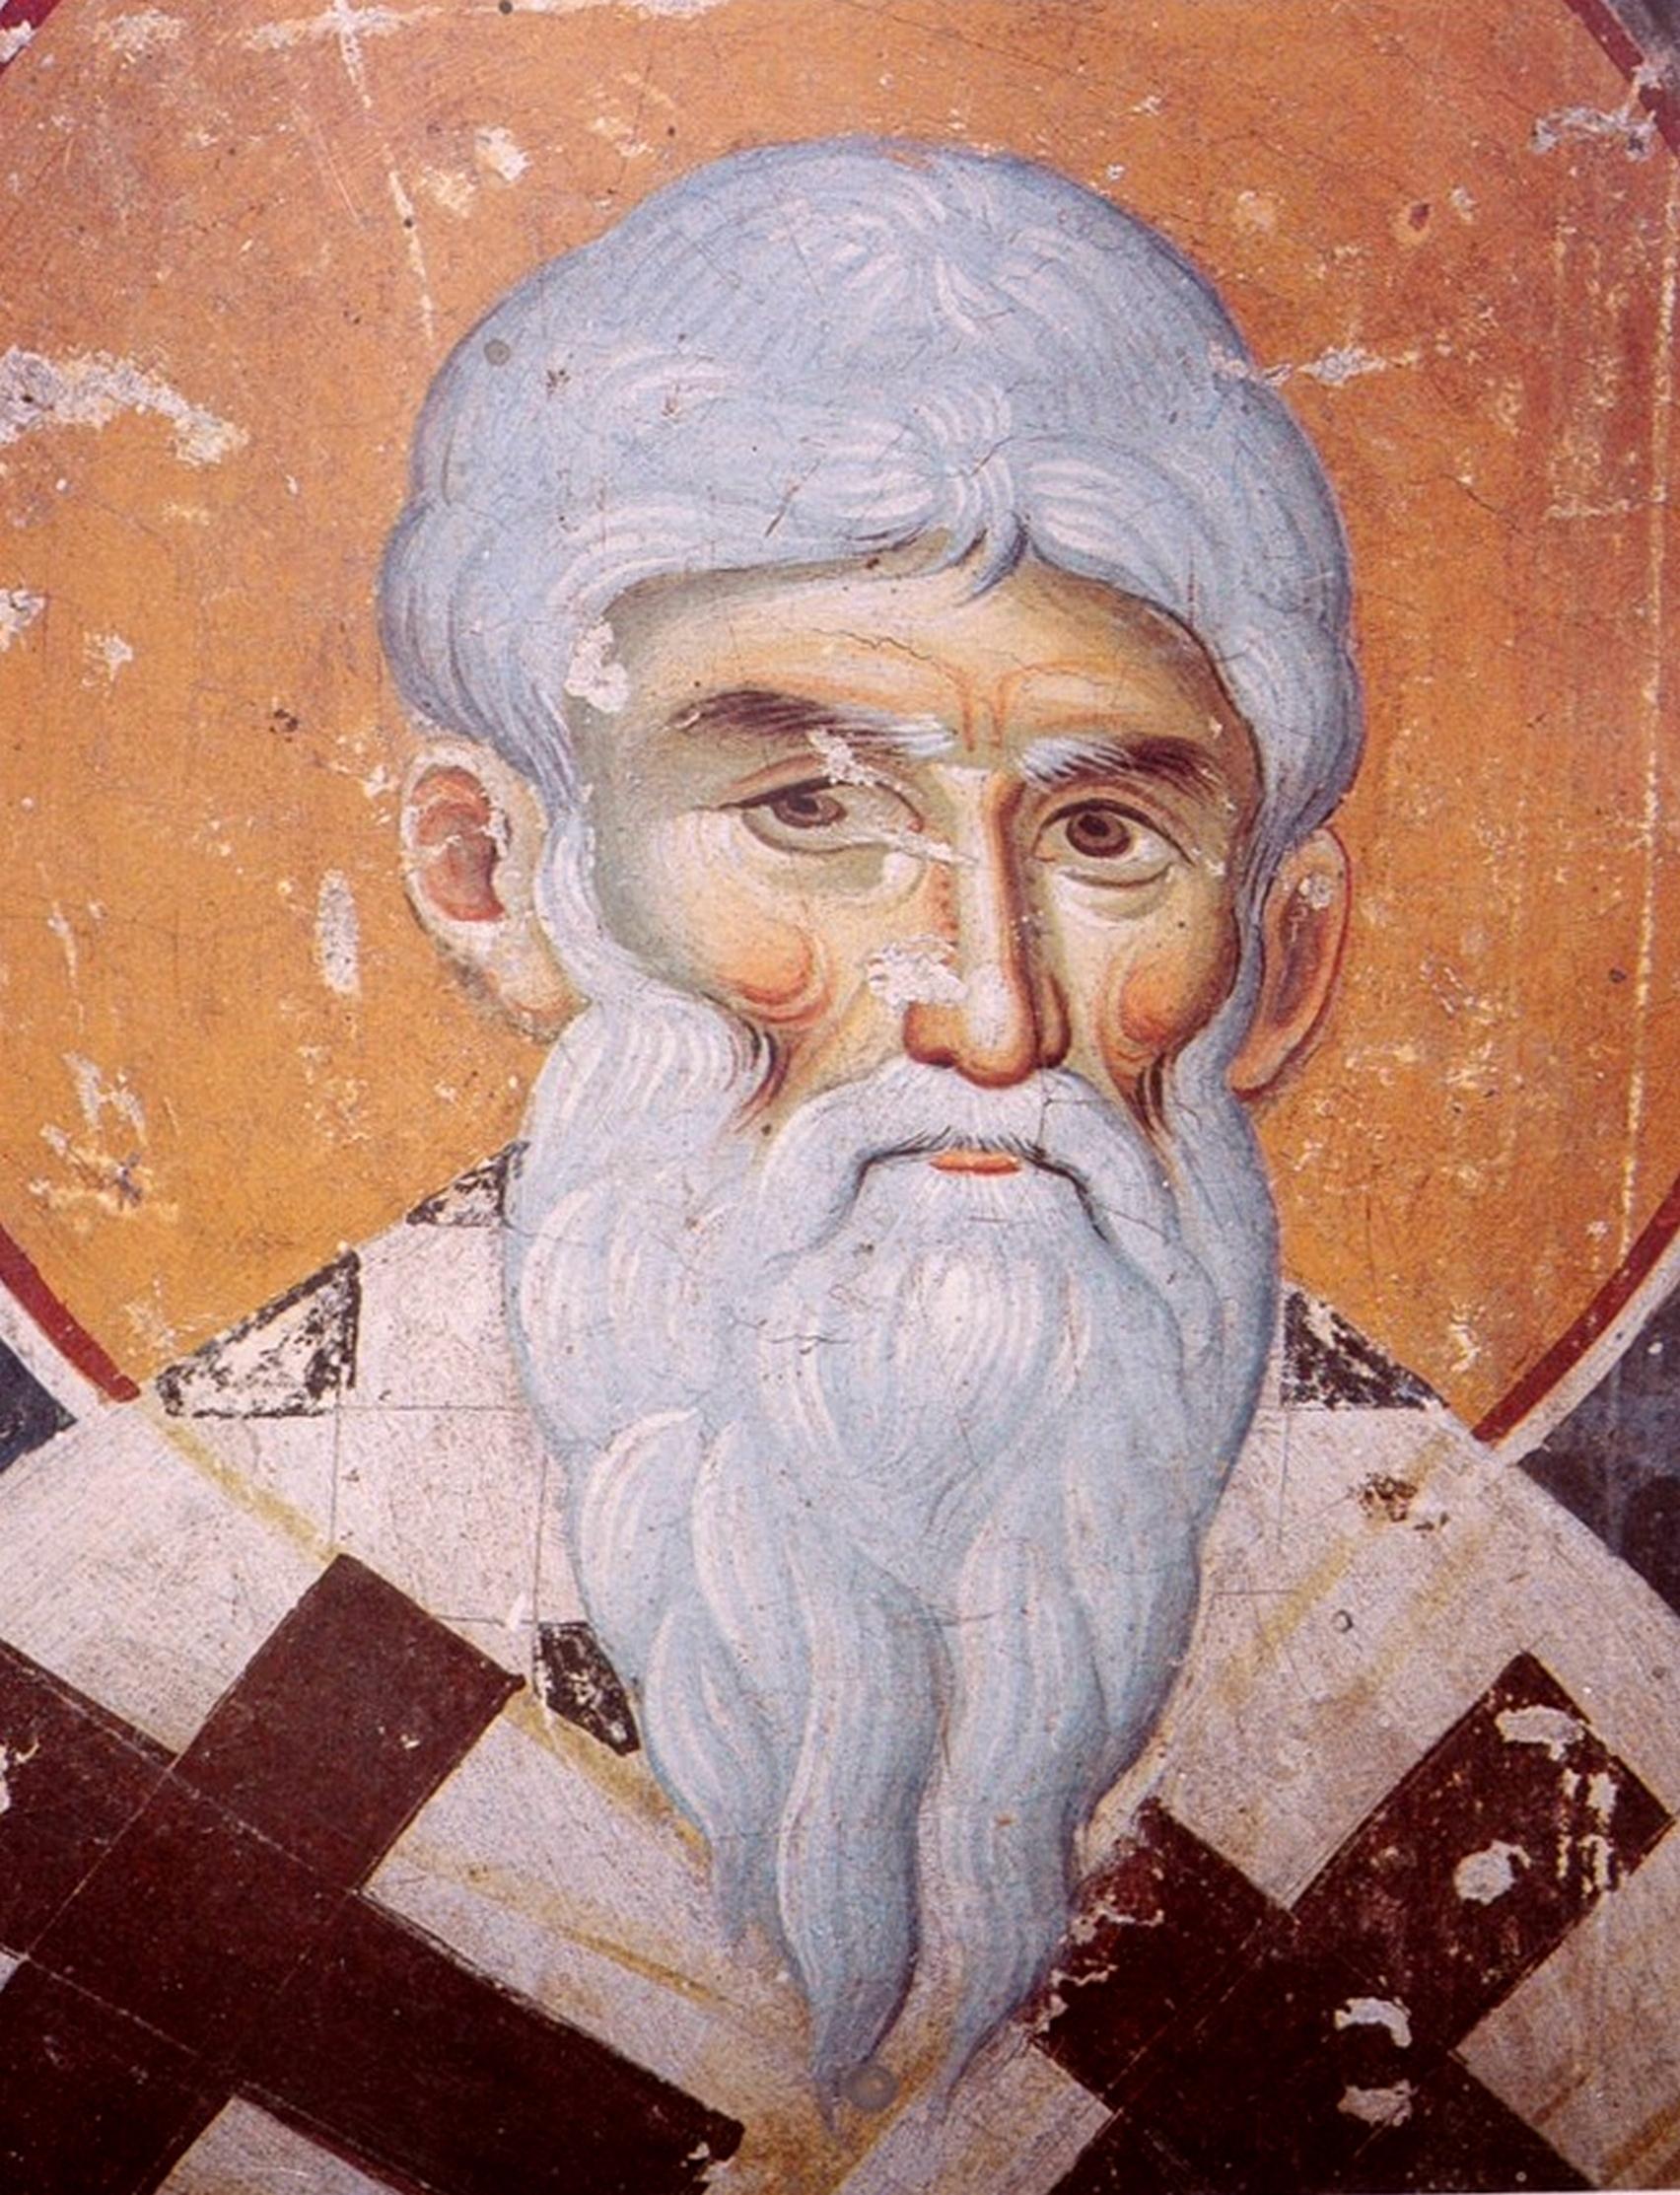 Священномученик Дионисий Ареопагит. Фреска конца XIII века в монастыре Протат на Афоне. Иконописец Мануил Панселин.